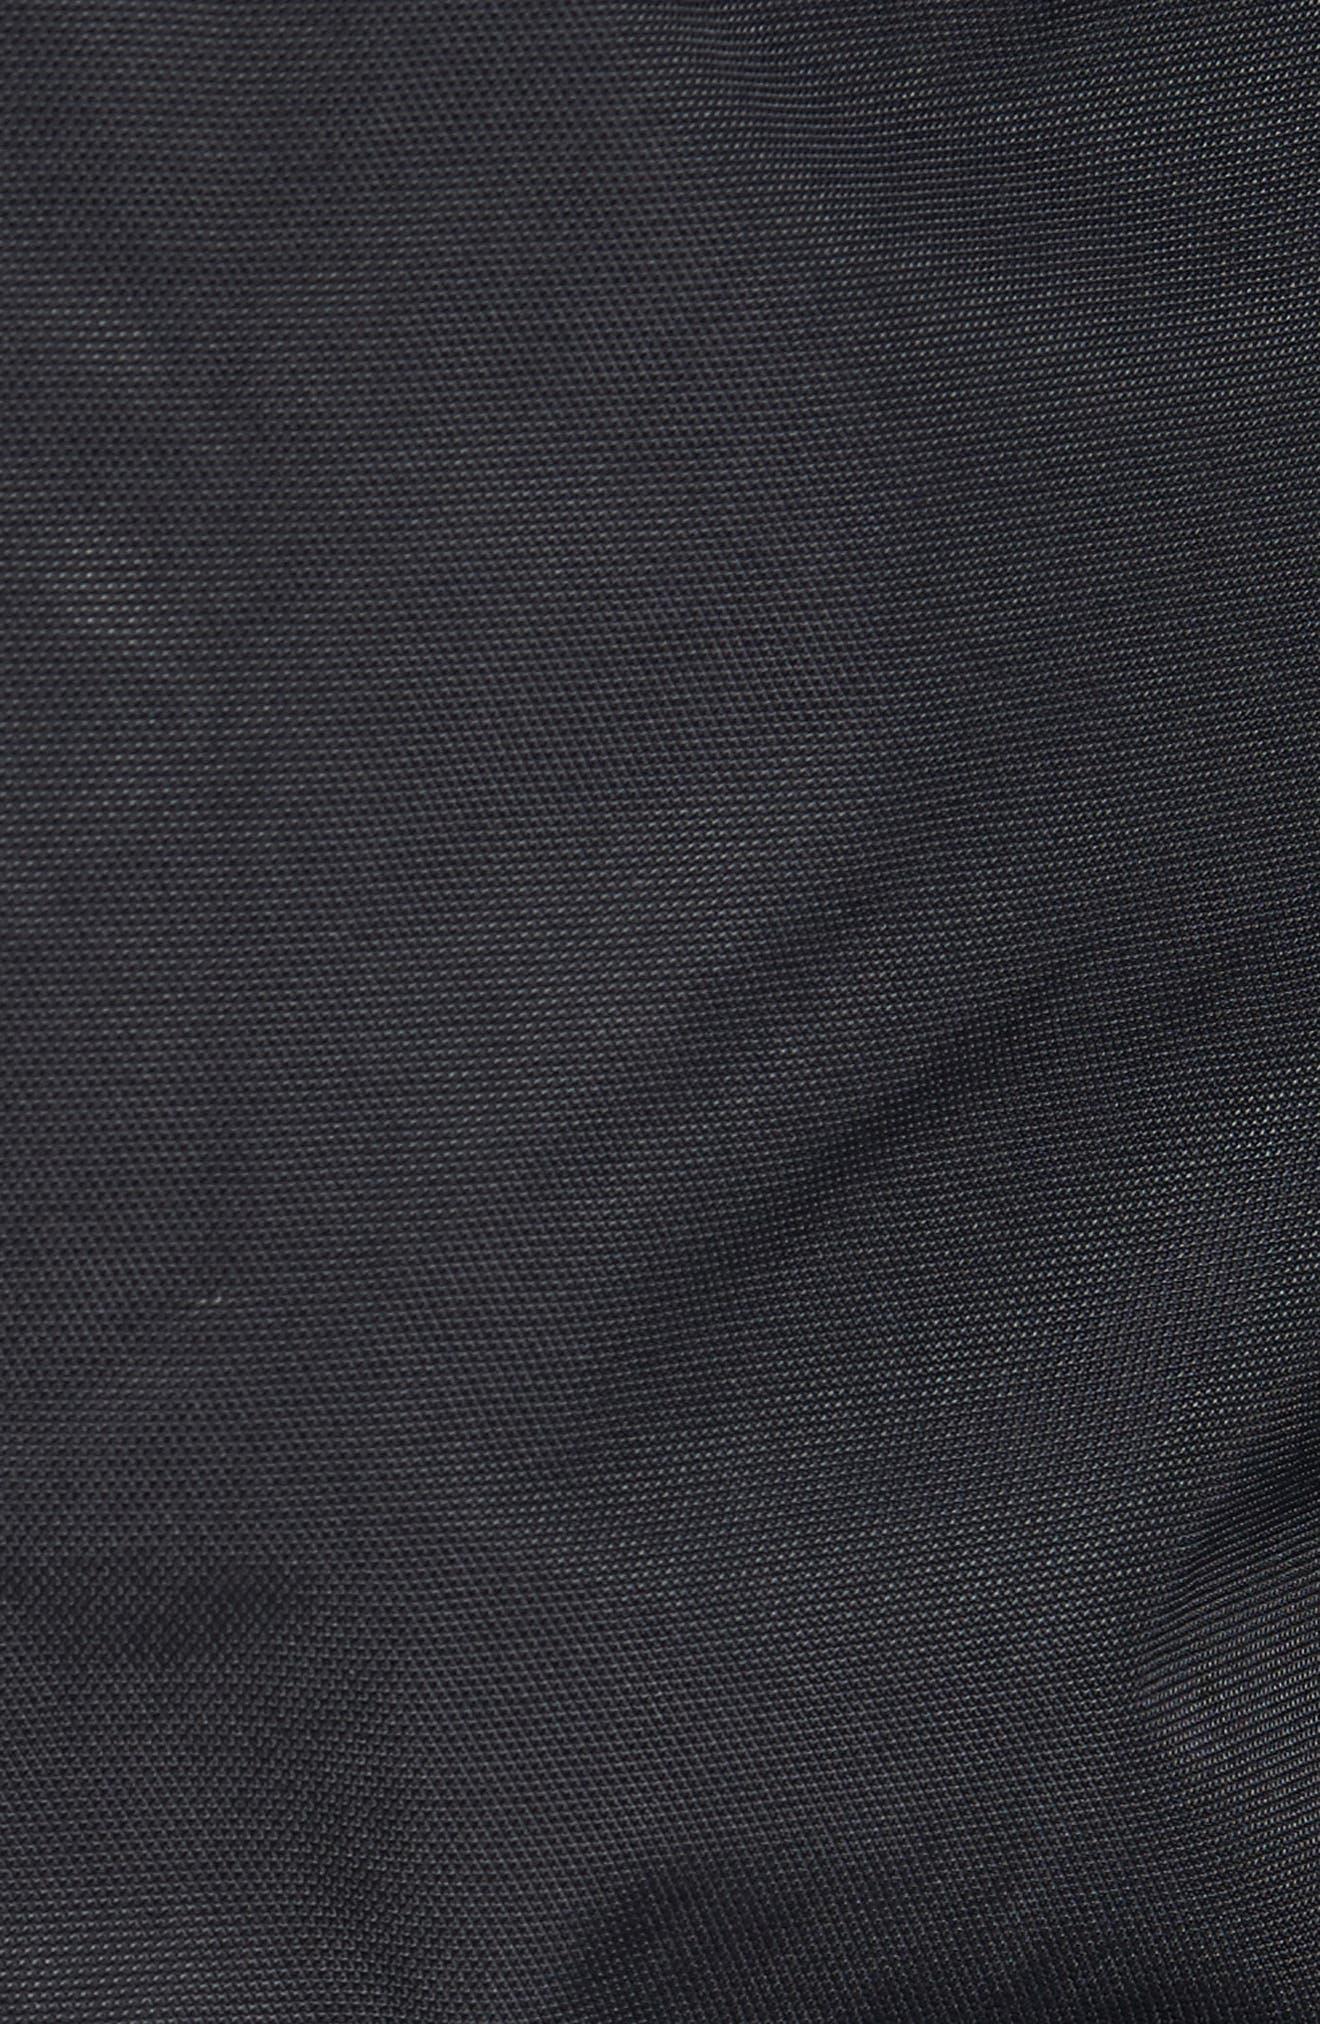 El Misti Trench II Hooded Jacket,                             Alternate thumbnail 7, color,                             BLACK